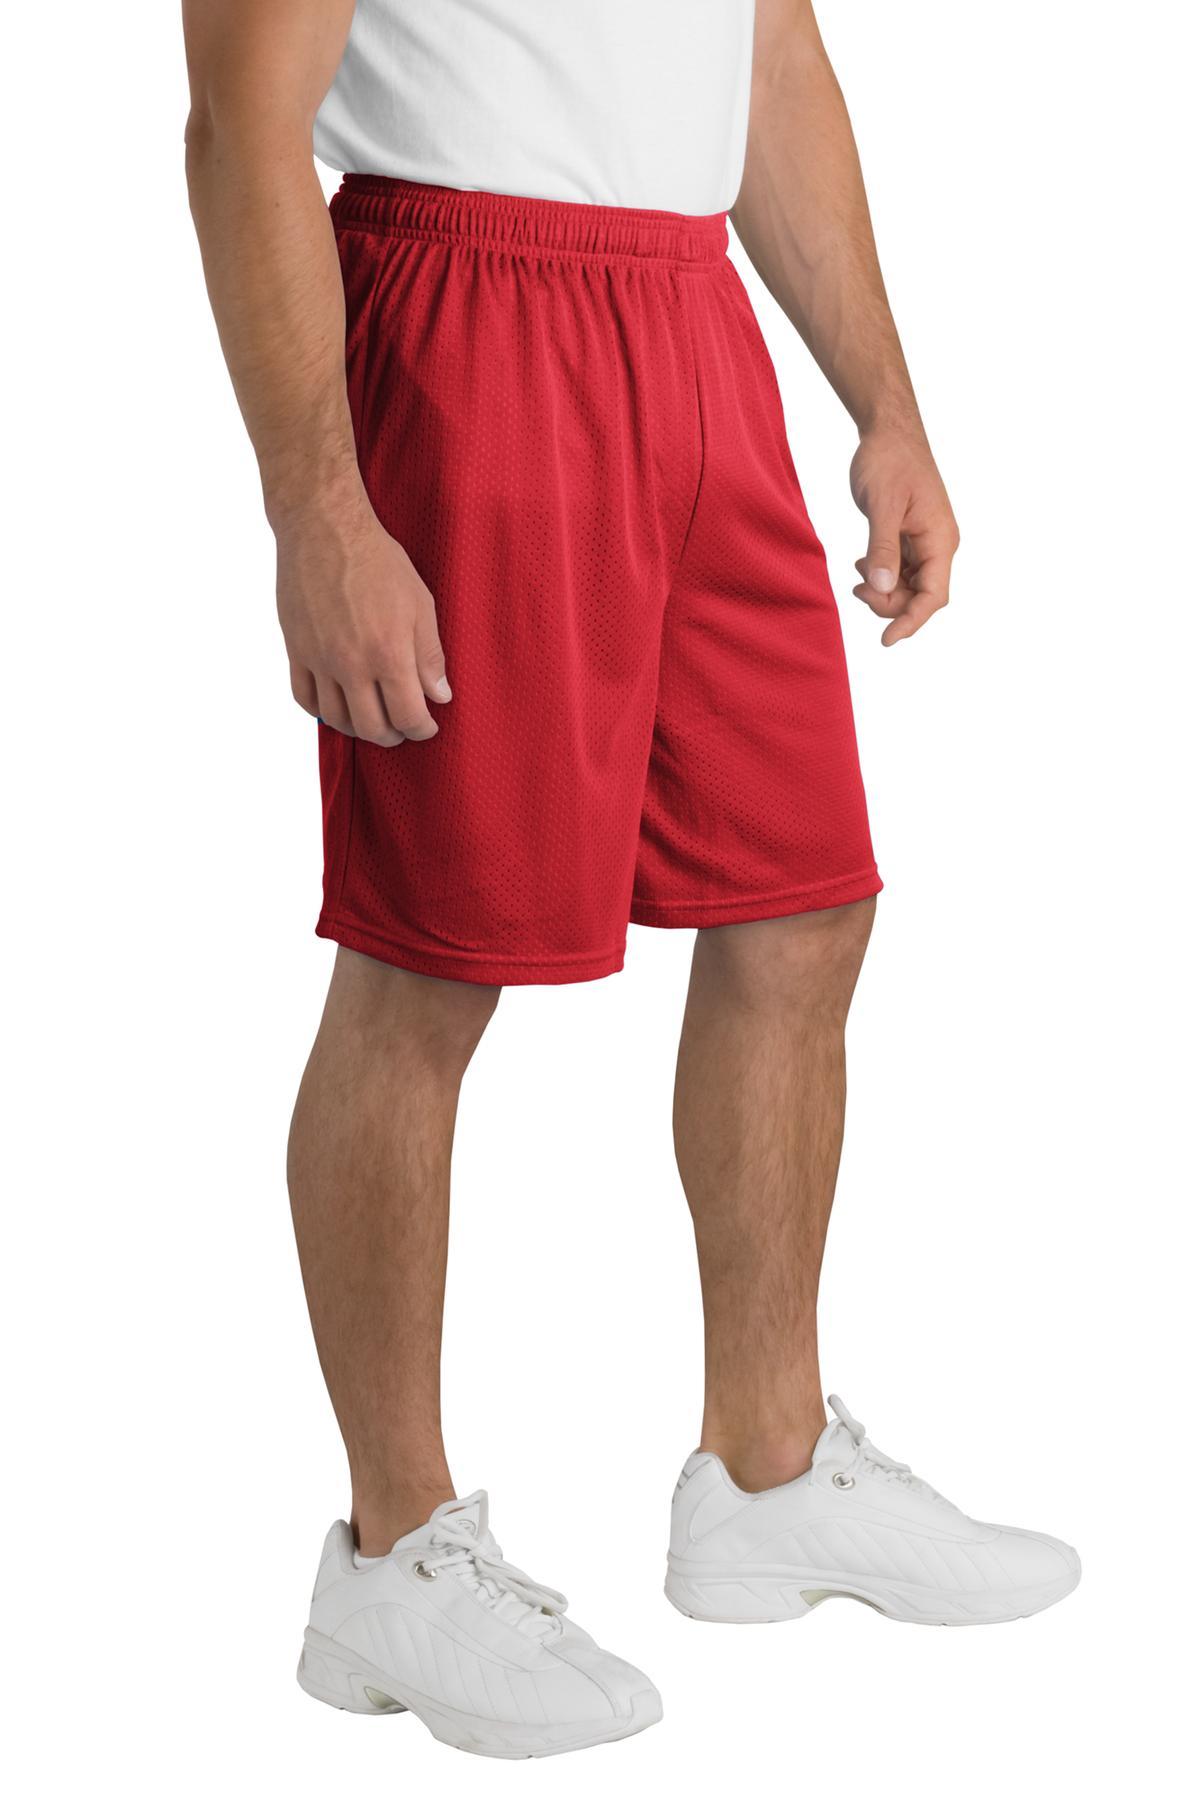 Shorts-12